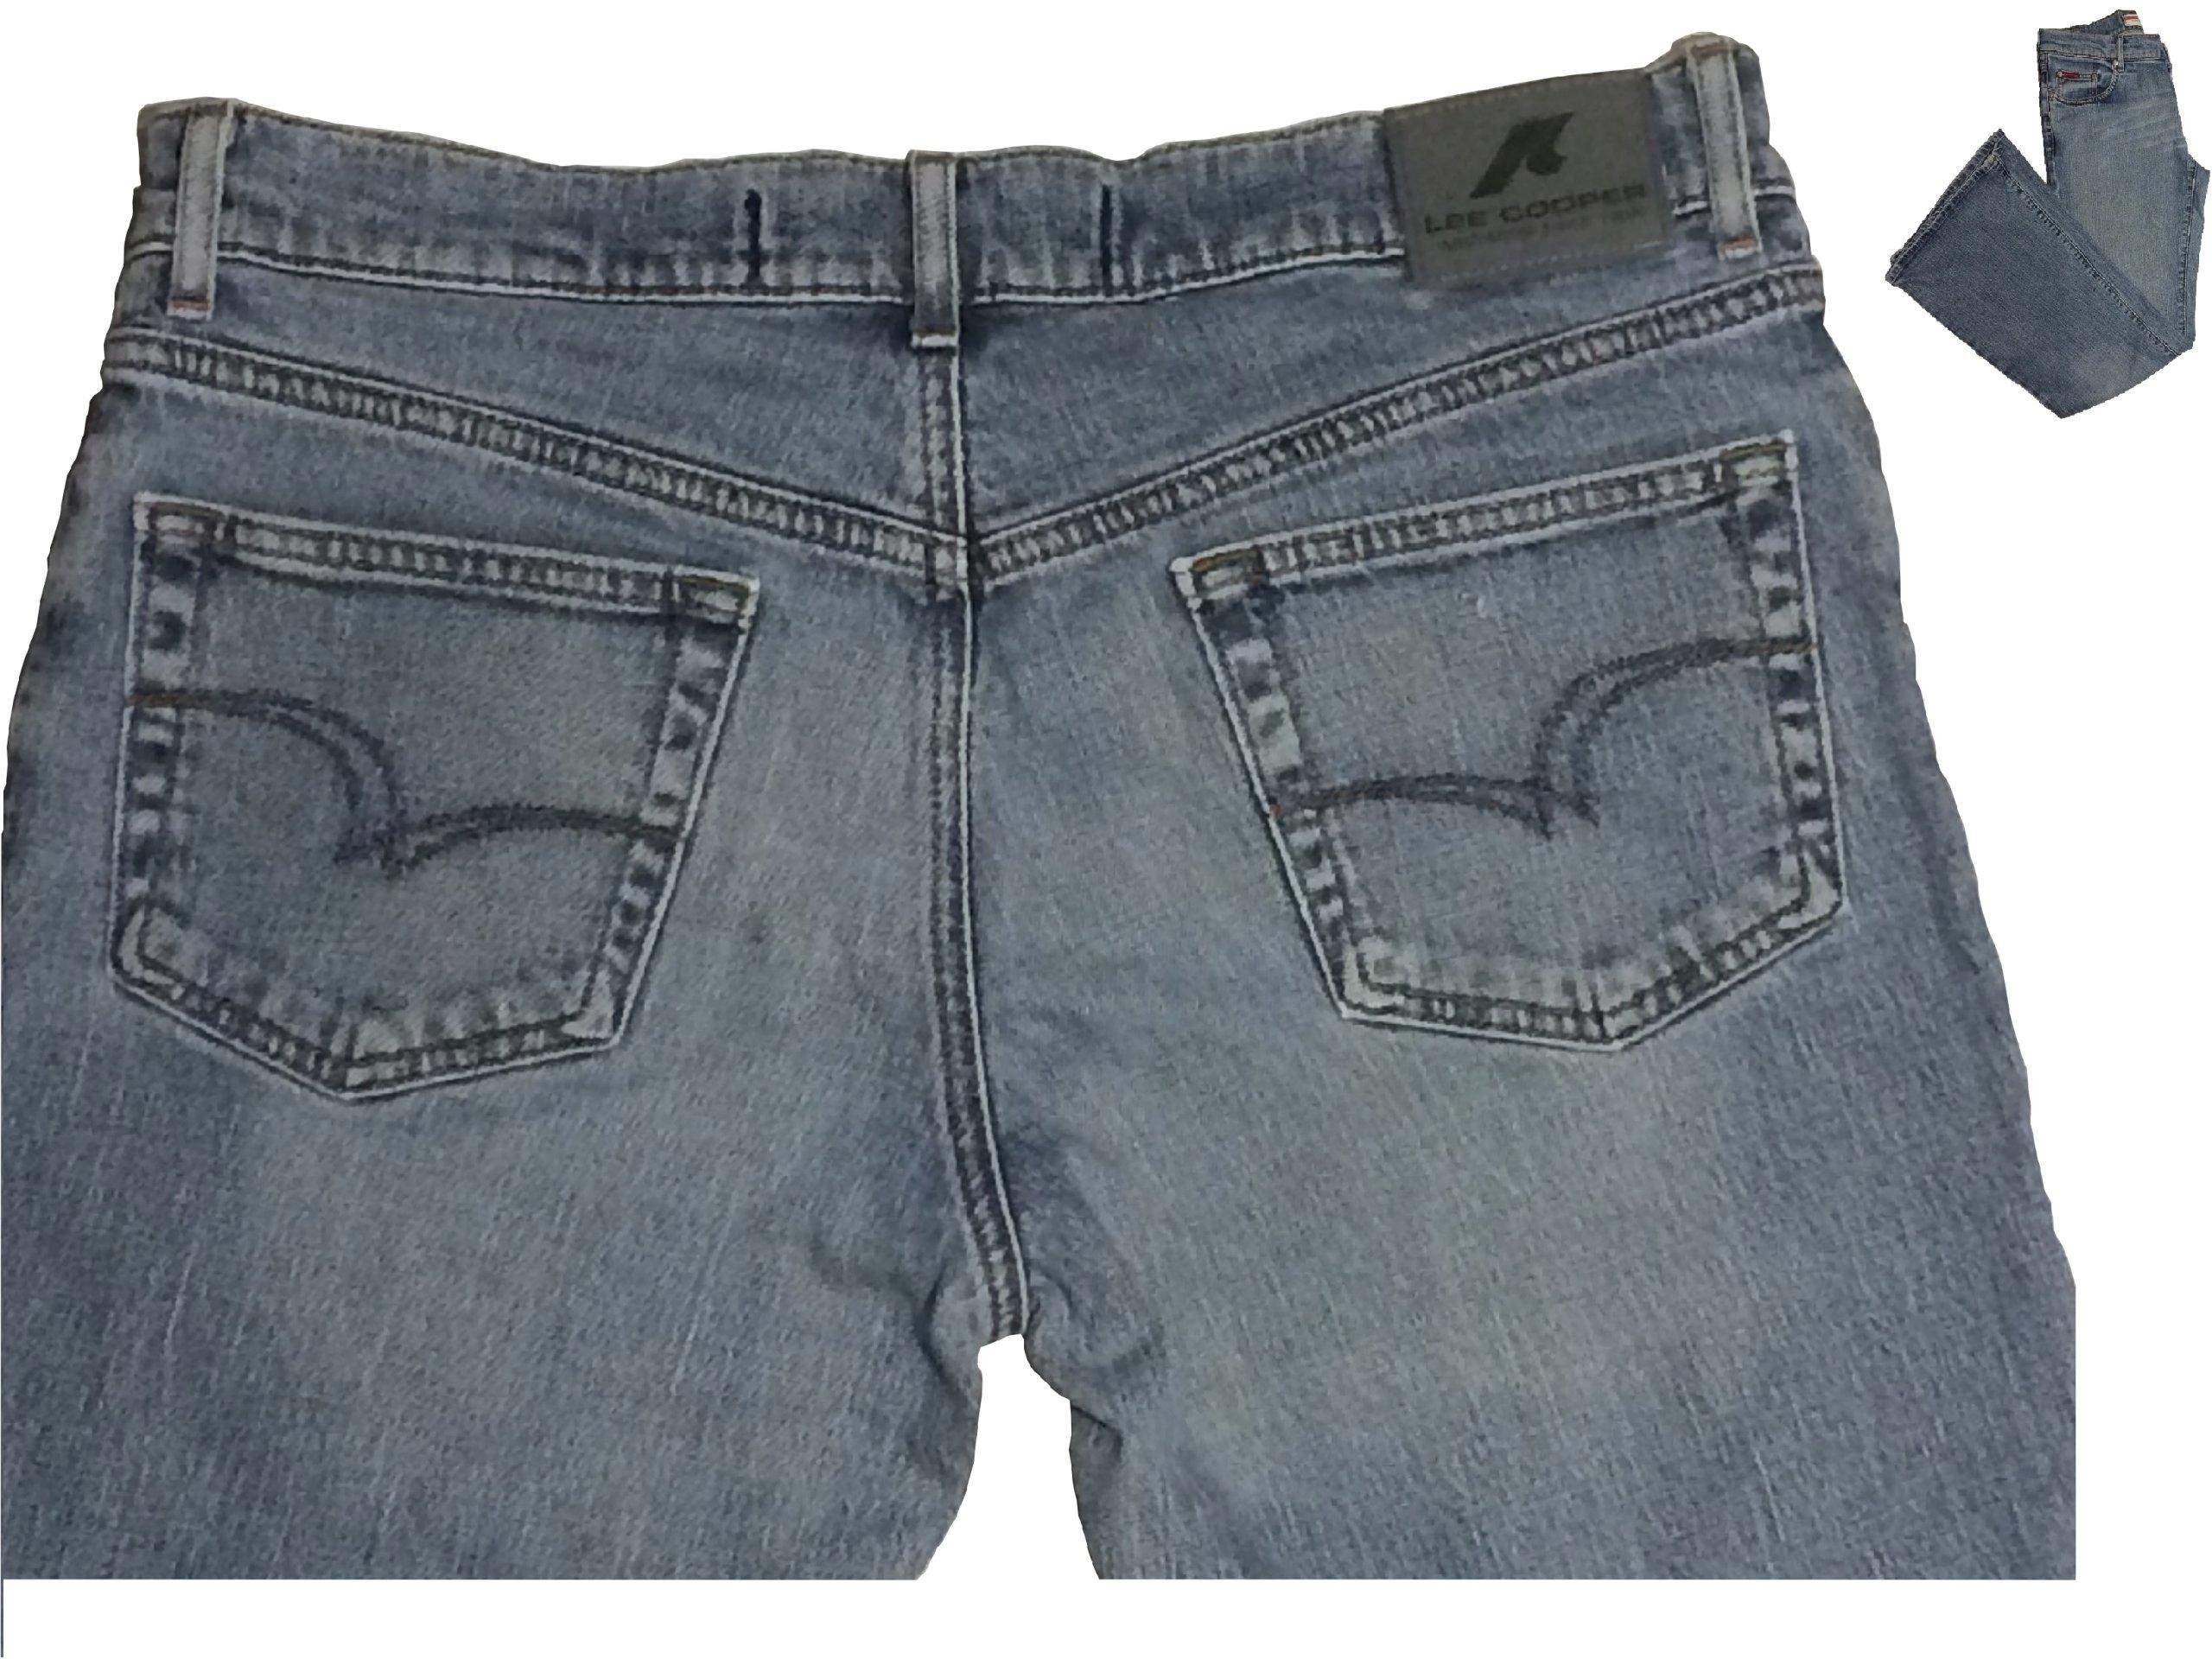 bb02fc7f7cdc Markowe spodnie damskie jeans Lee Cooper r. 33 - 6730013309 ...